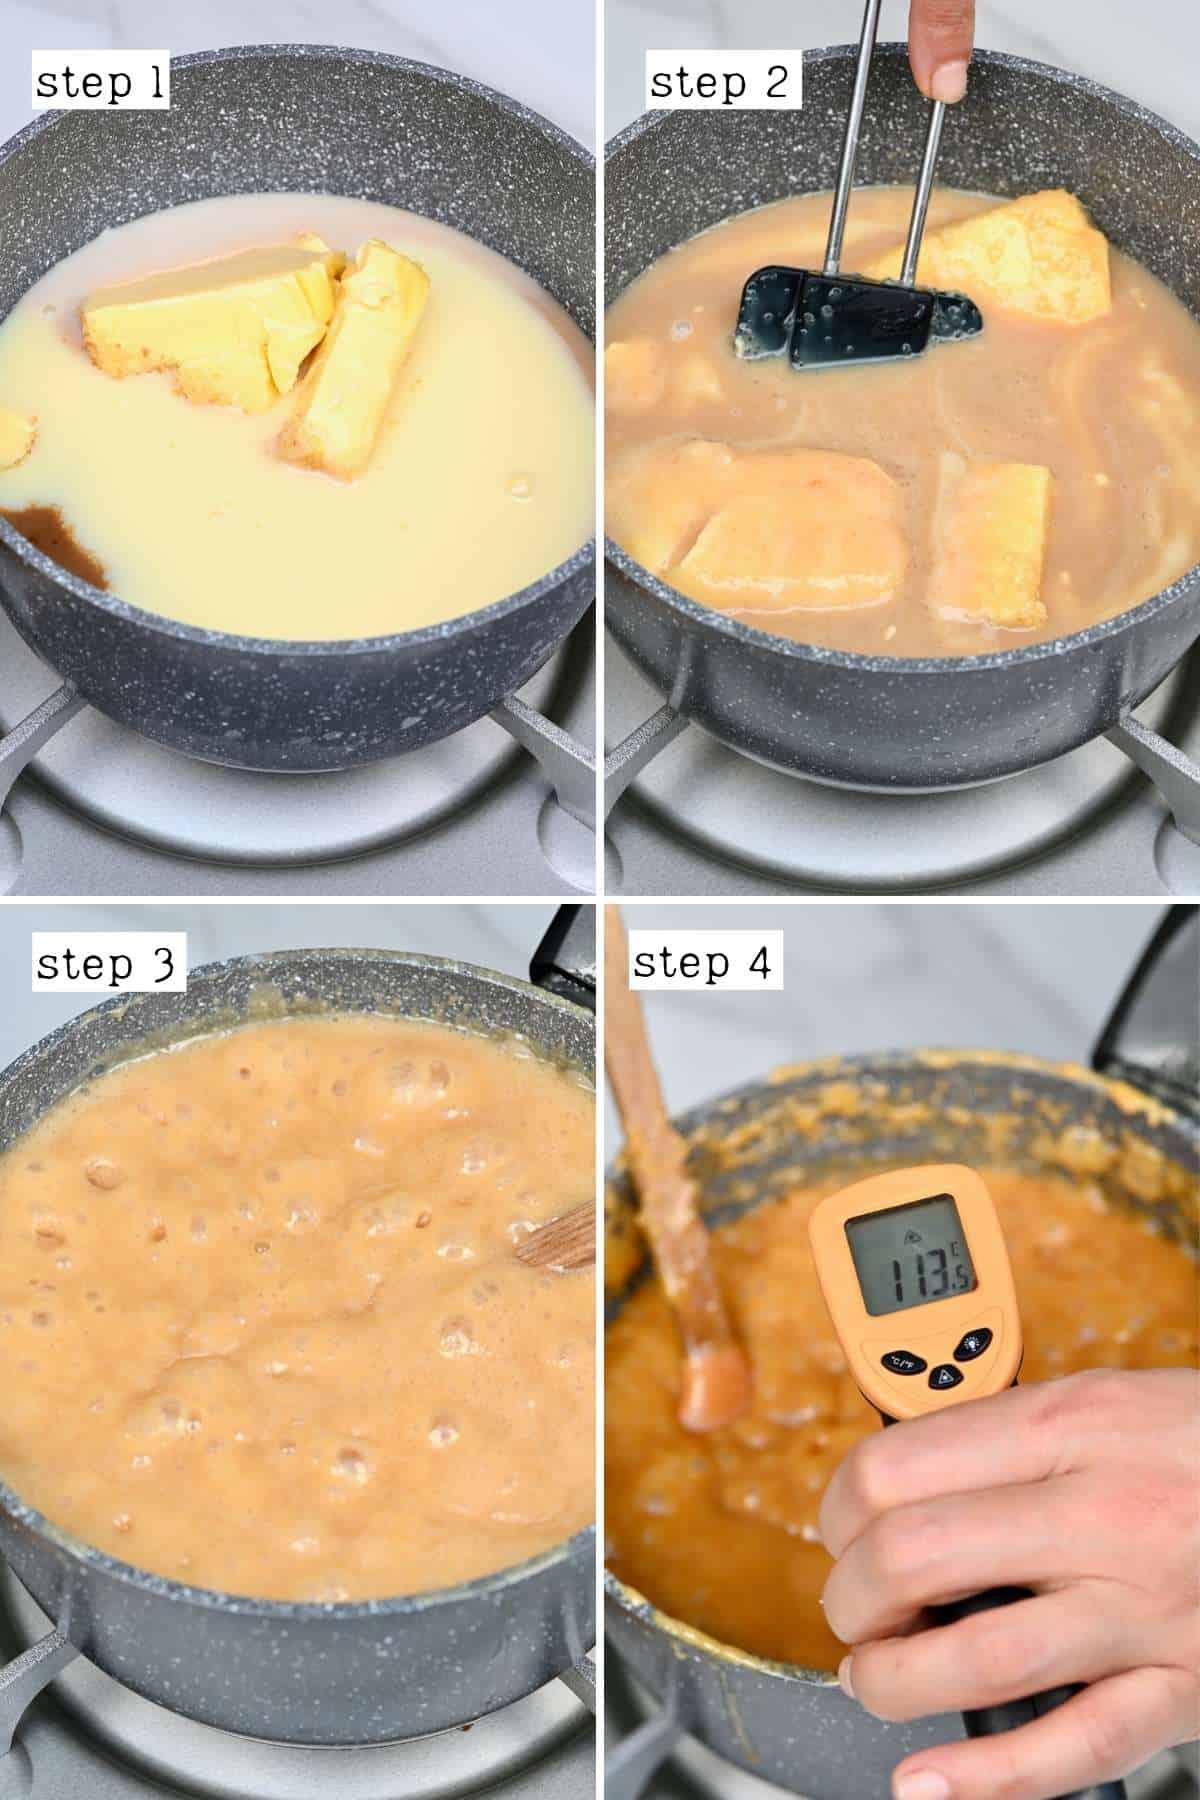 Steps for preparing fudge